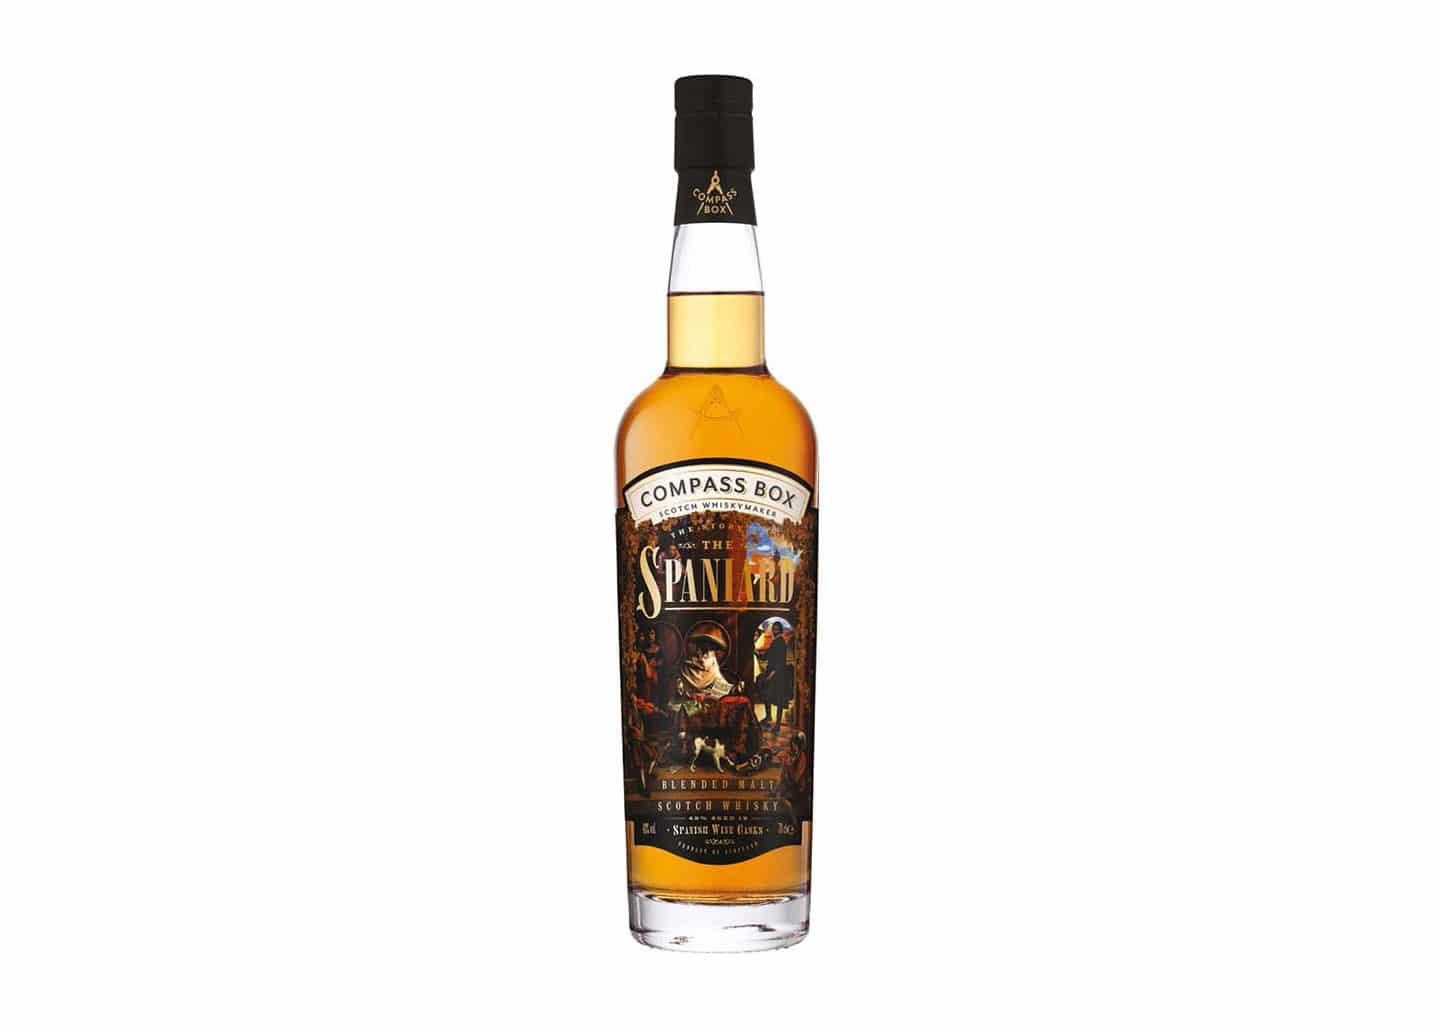 Compass Box The Spaniard - Todo Whisky